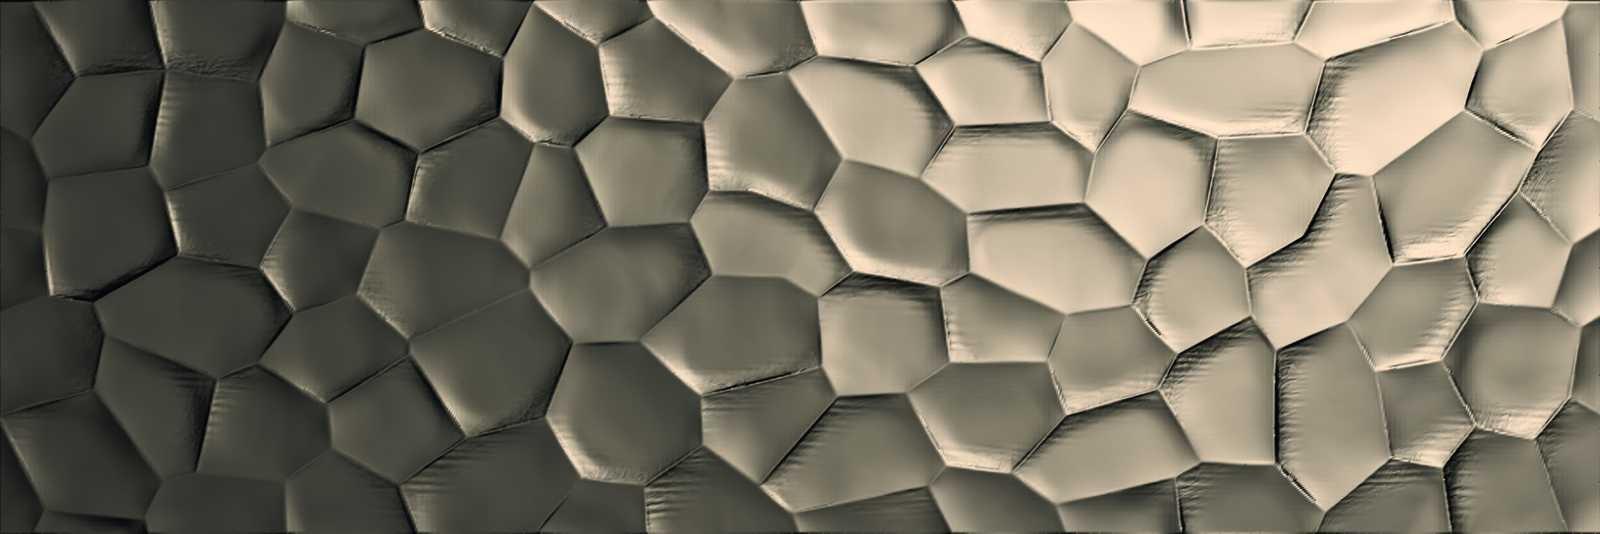 Декор Essenziale Struttura Deco 3D Metal 40x120